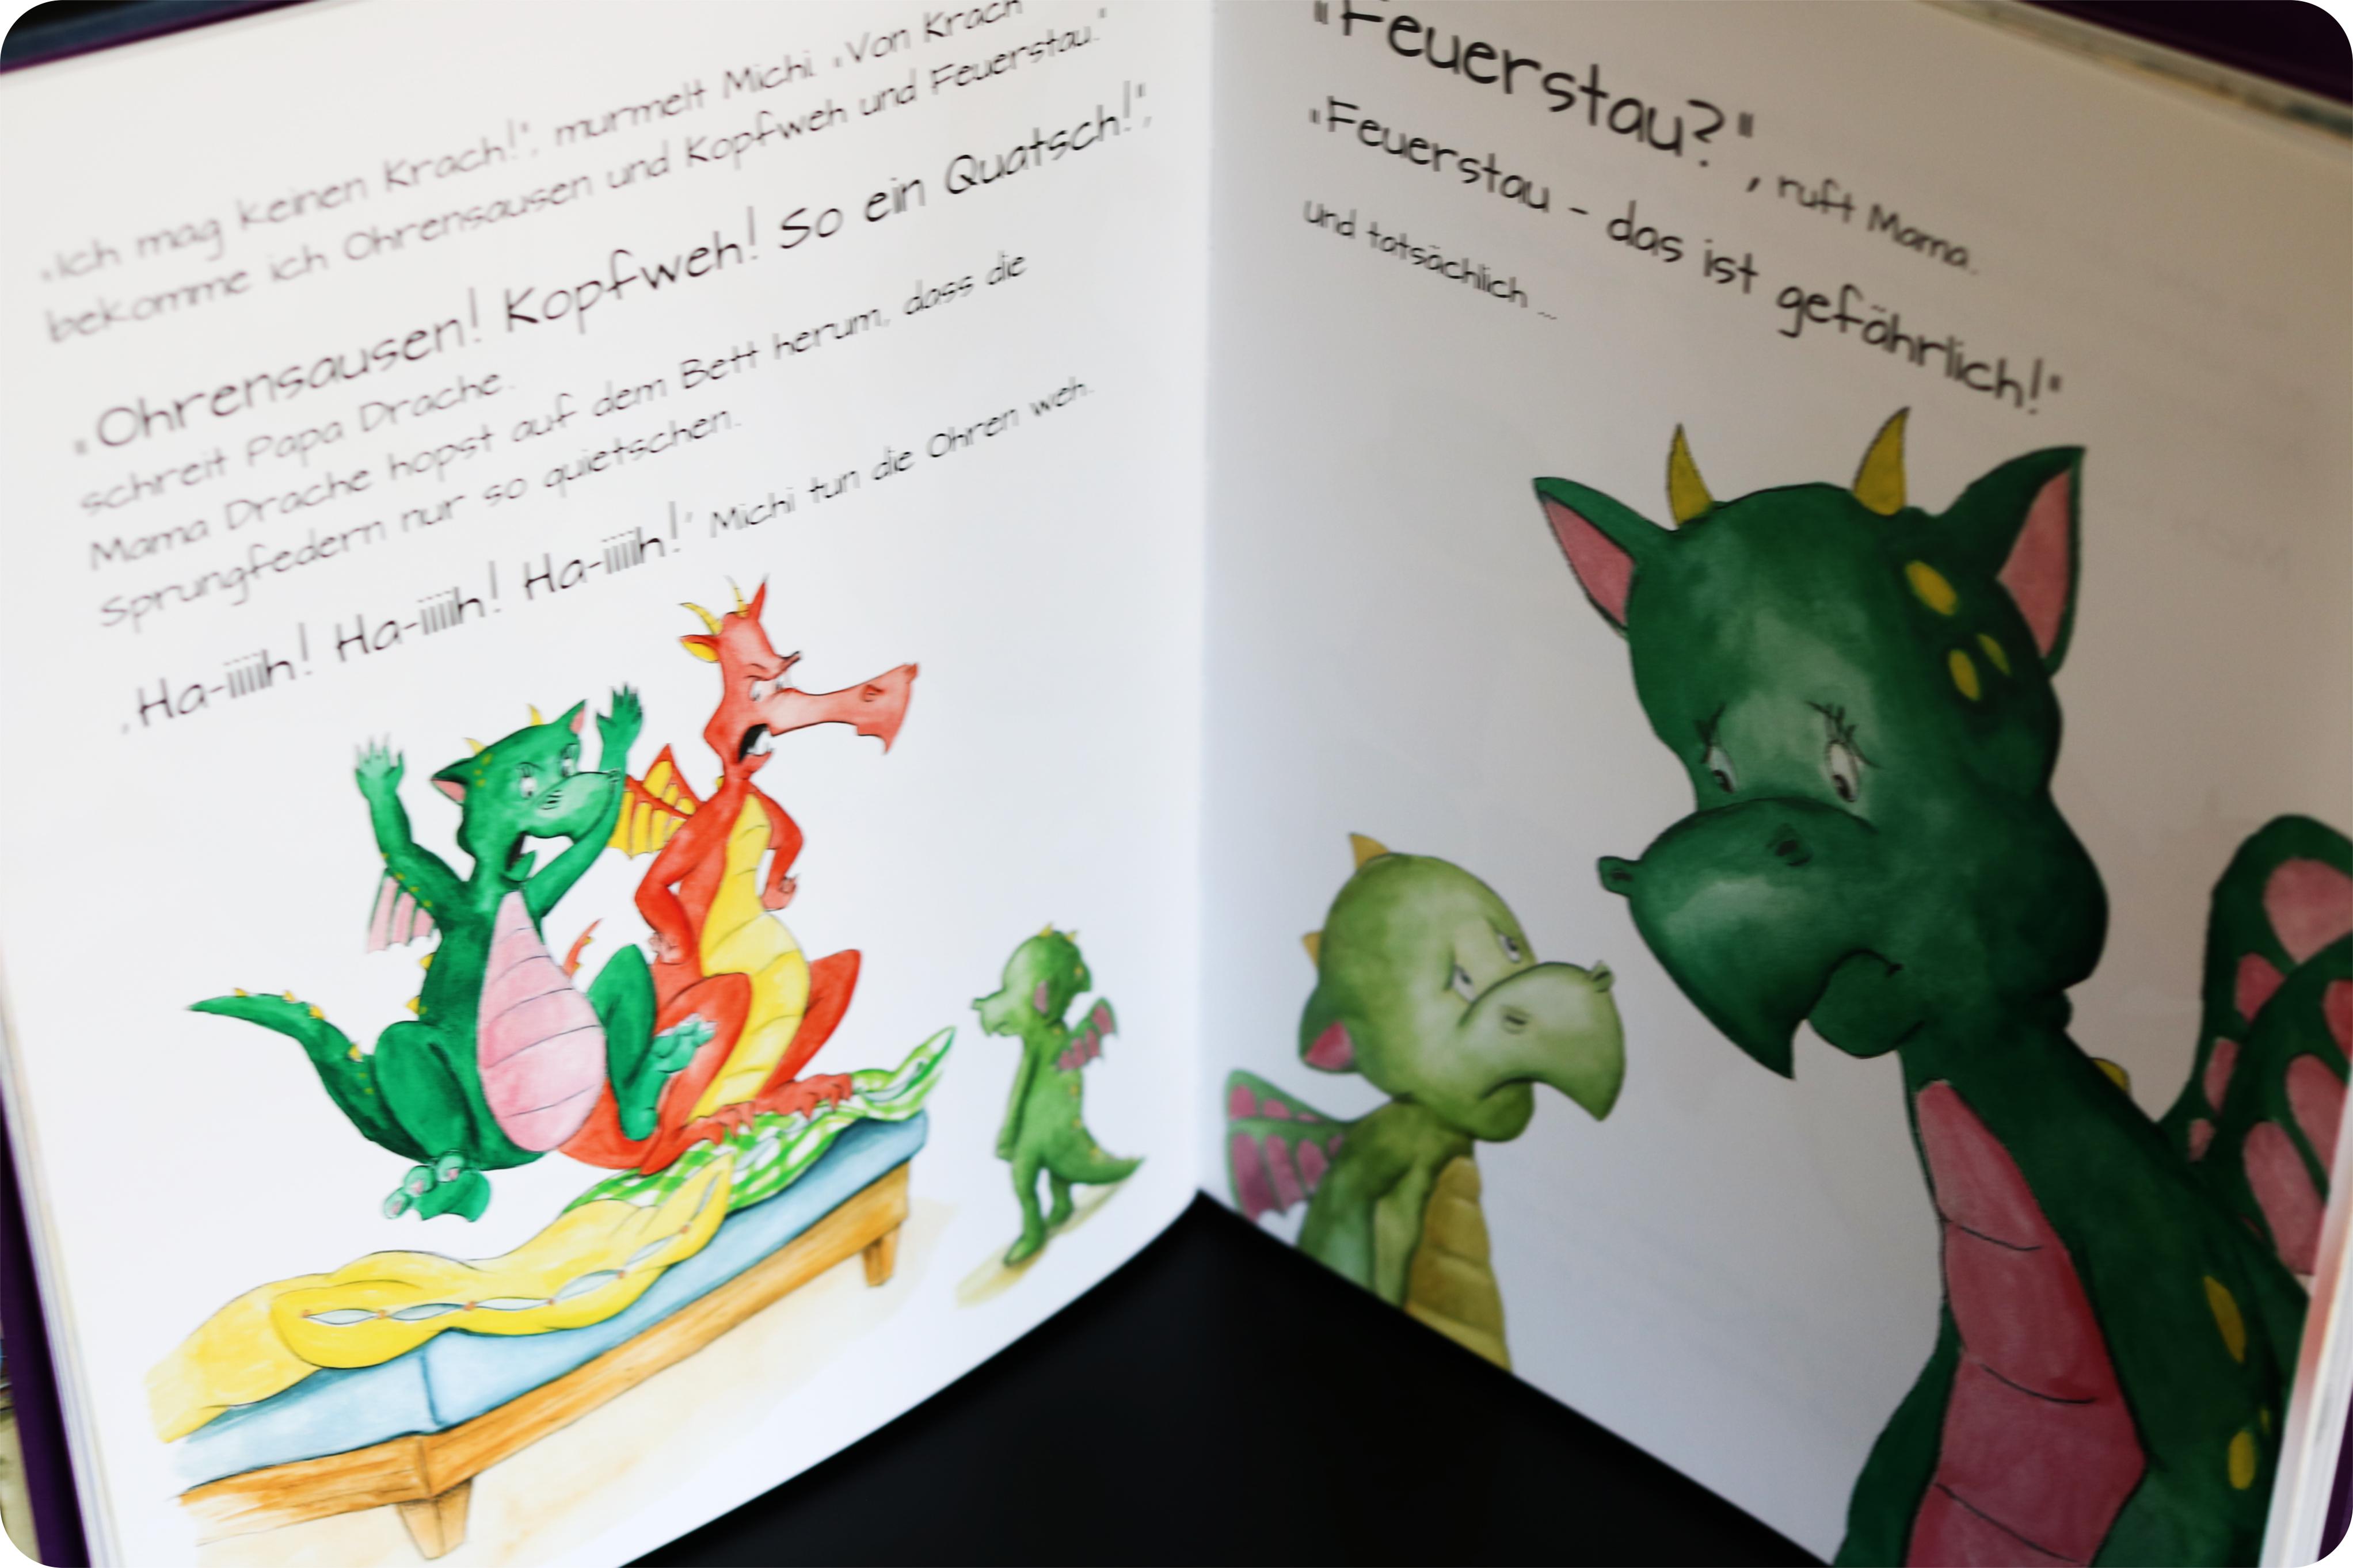 Drachen machen Krach - Barbara Peters